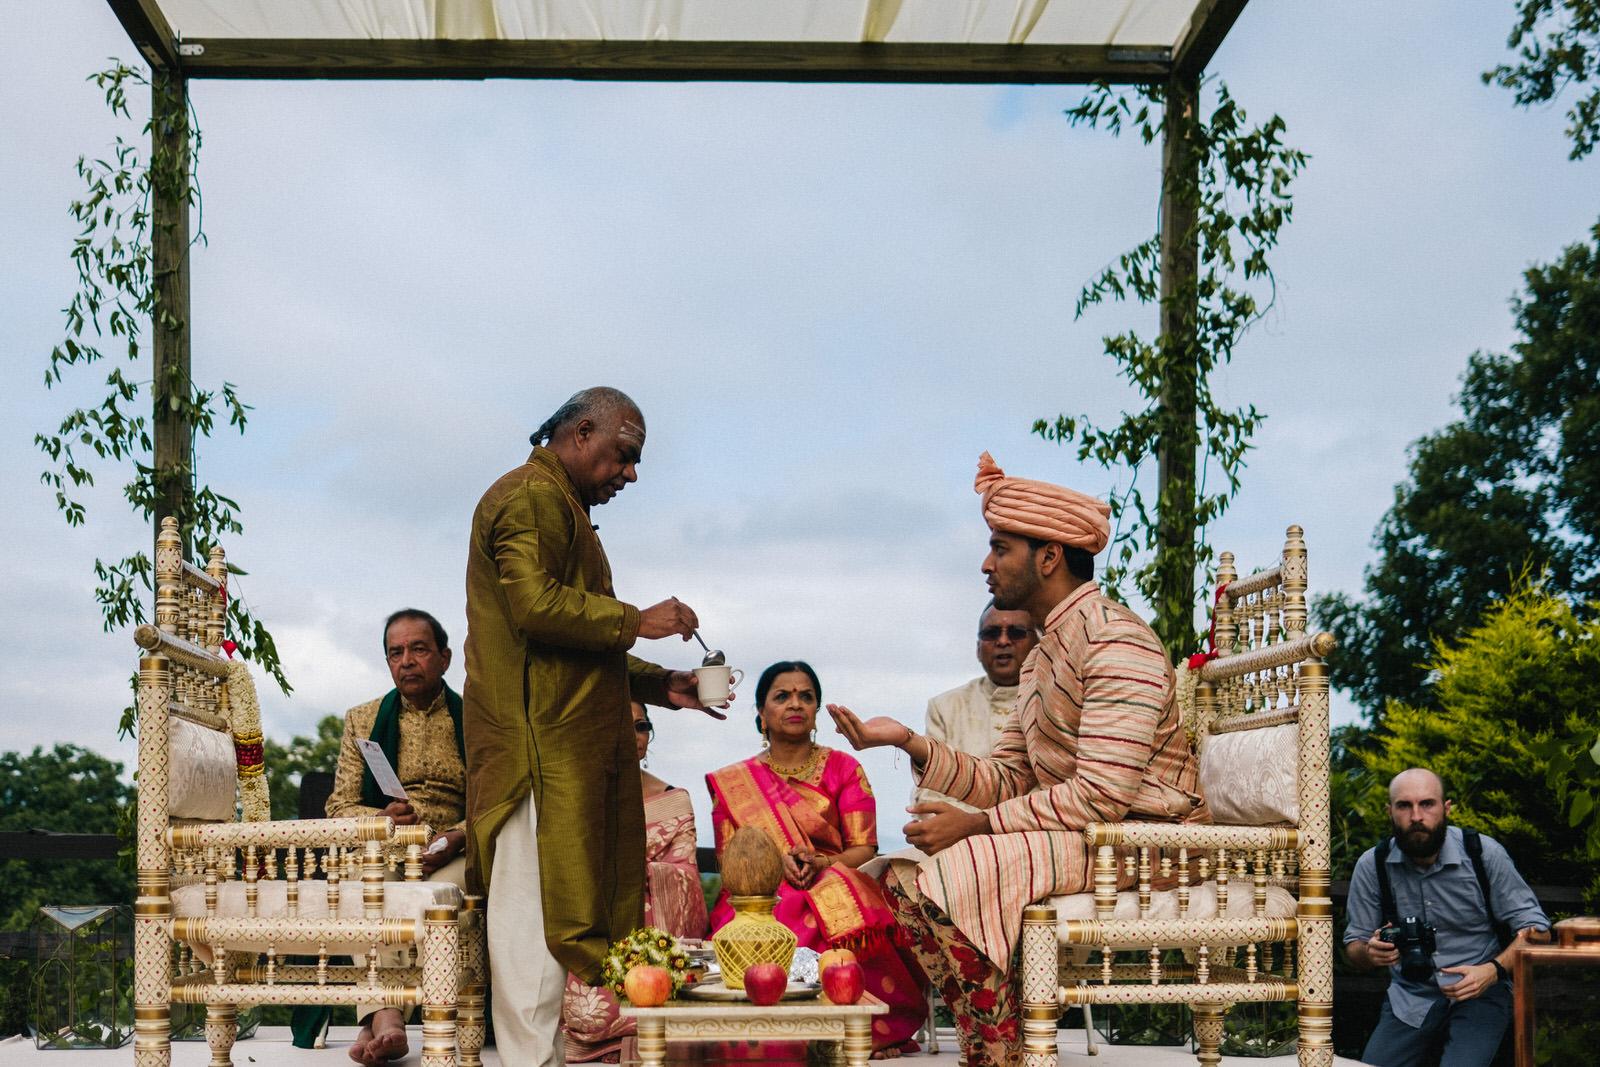 mississippi-wedding-photographer-BTS-153.JPG